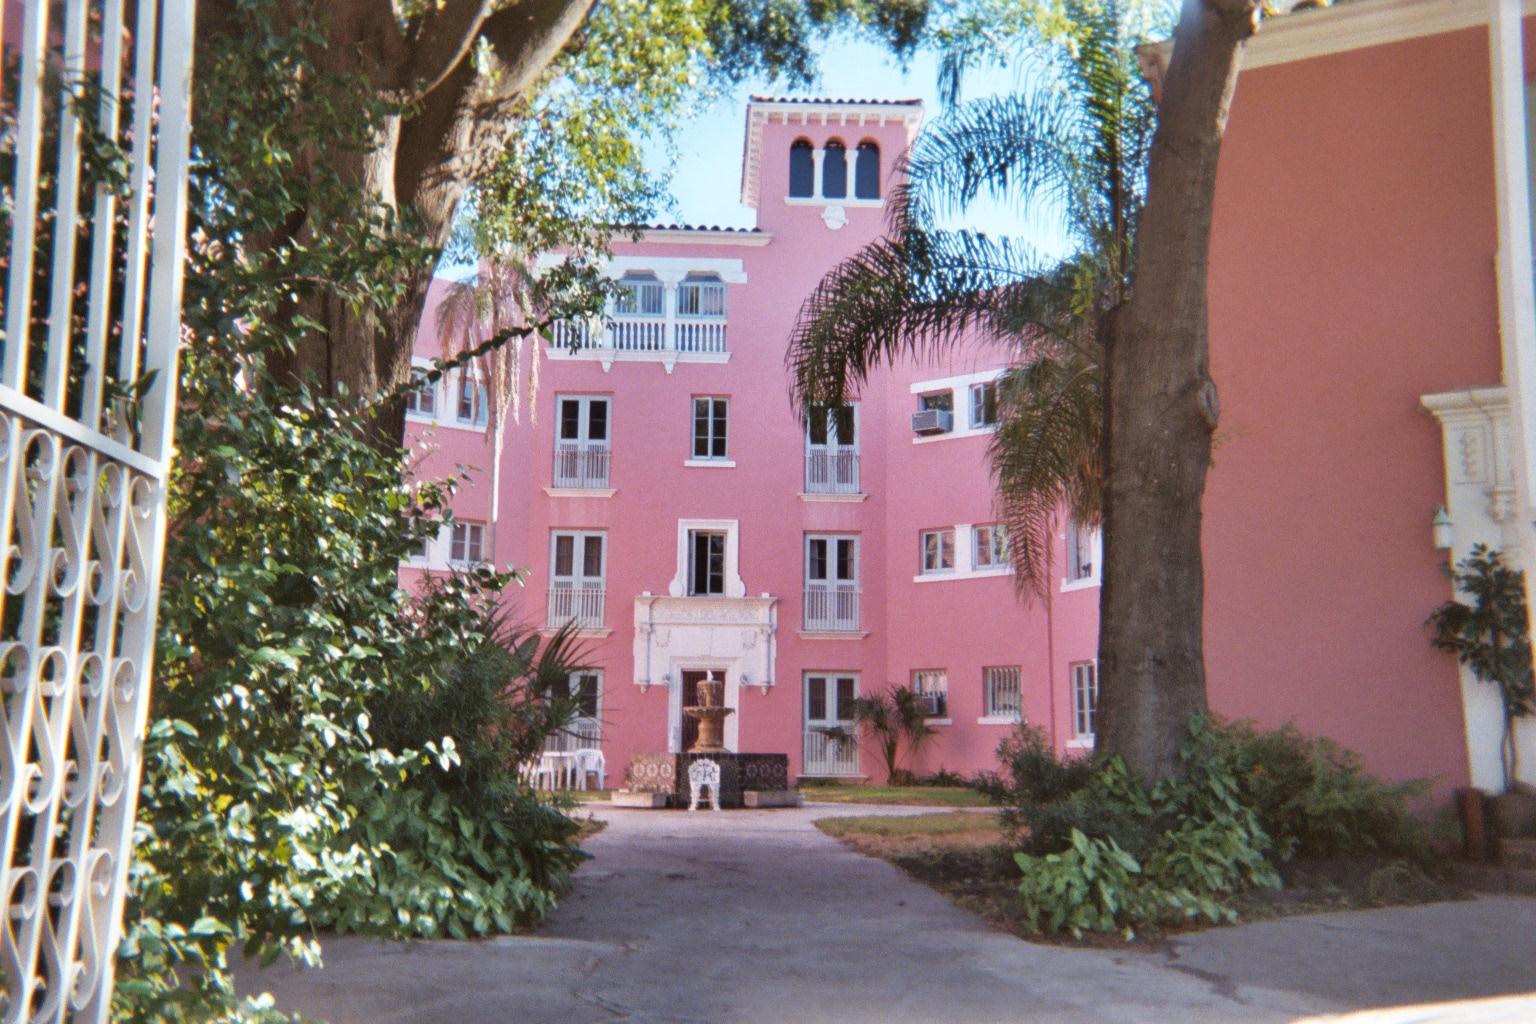 Spanish Villa Apartments Savannah Ga Reviews